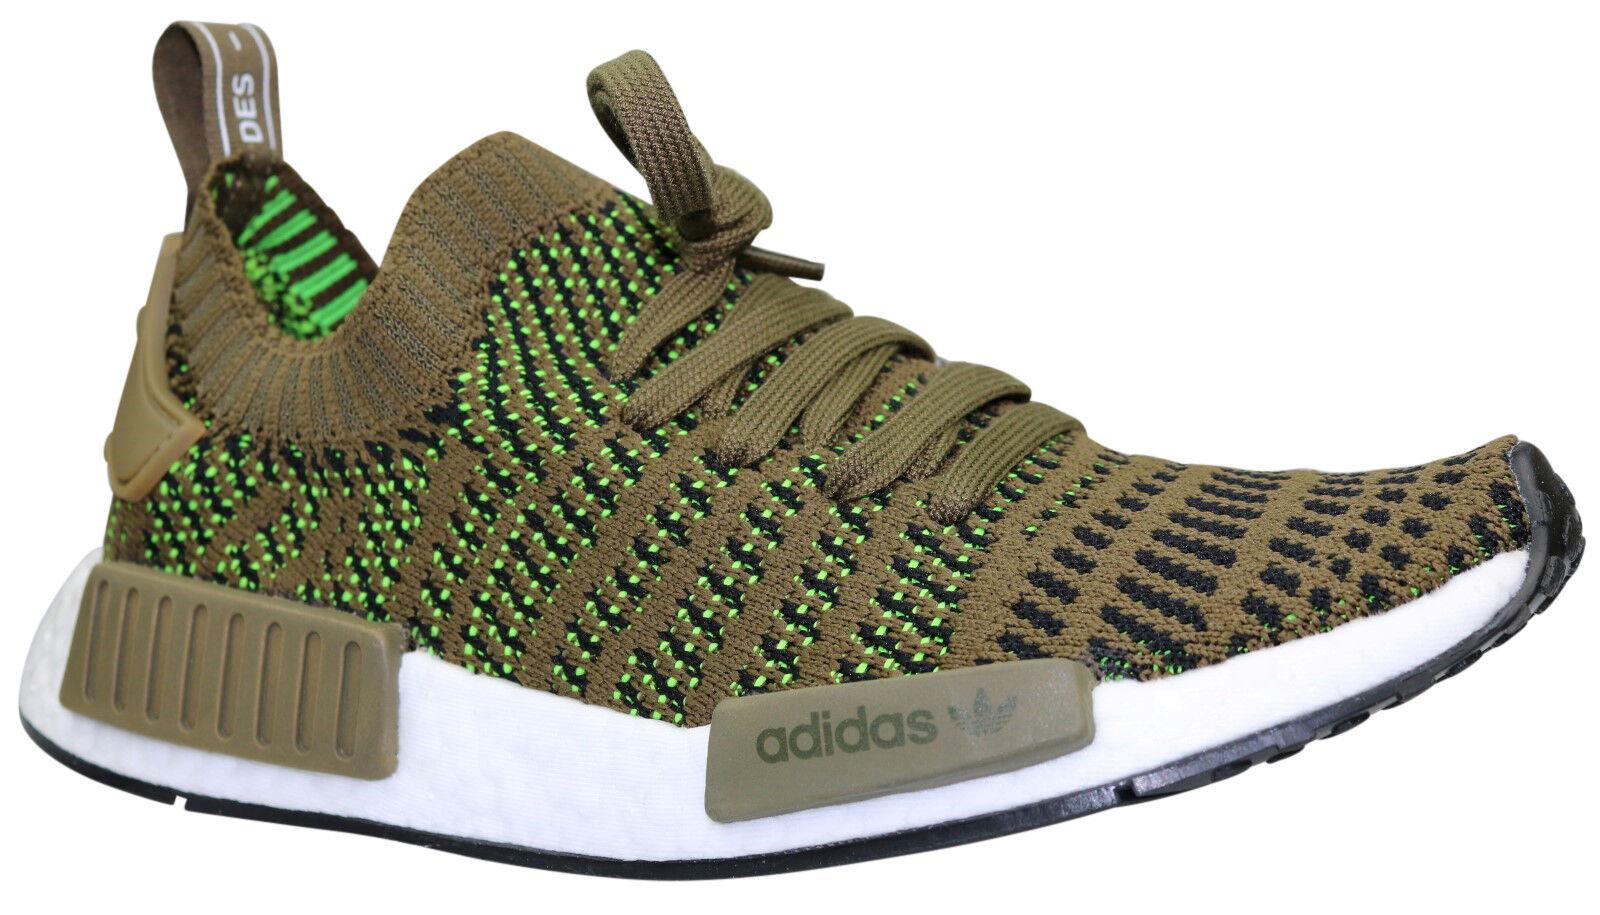 ADIDAS NMD r1 stlt PK Primeknit Scarpe Sneaker cq2389 Verde Taglia 36 - 47 NUOVO & OVP